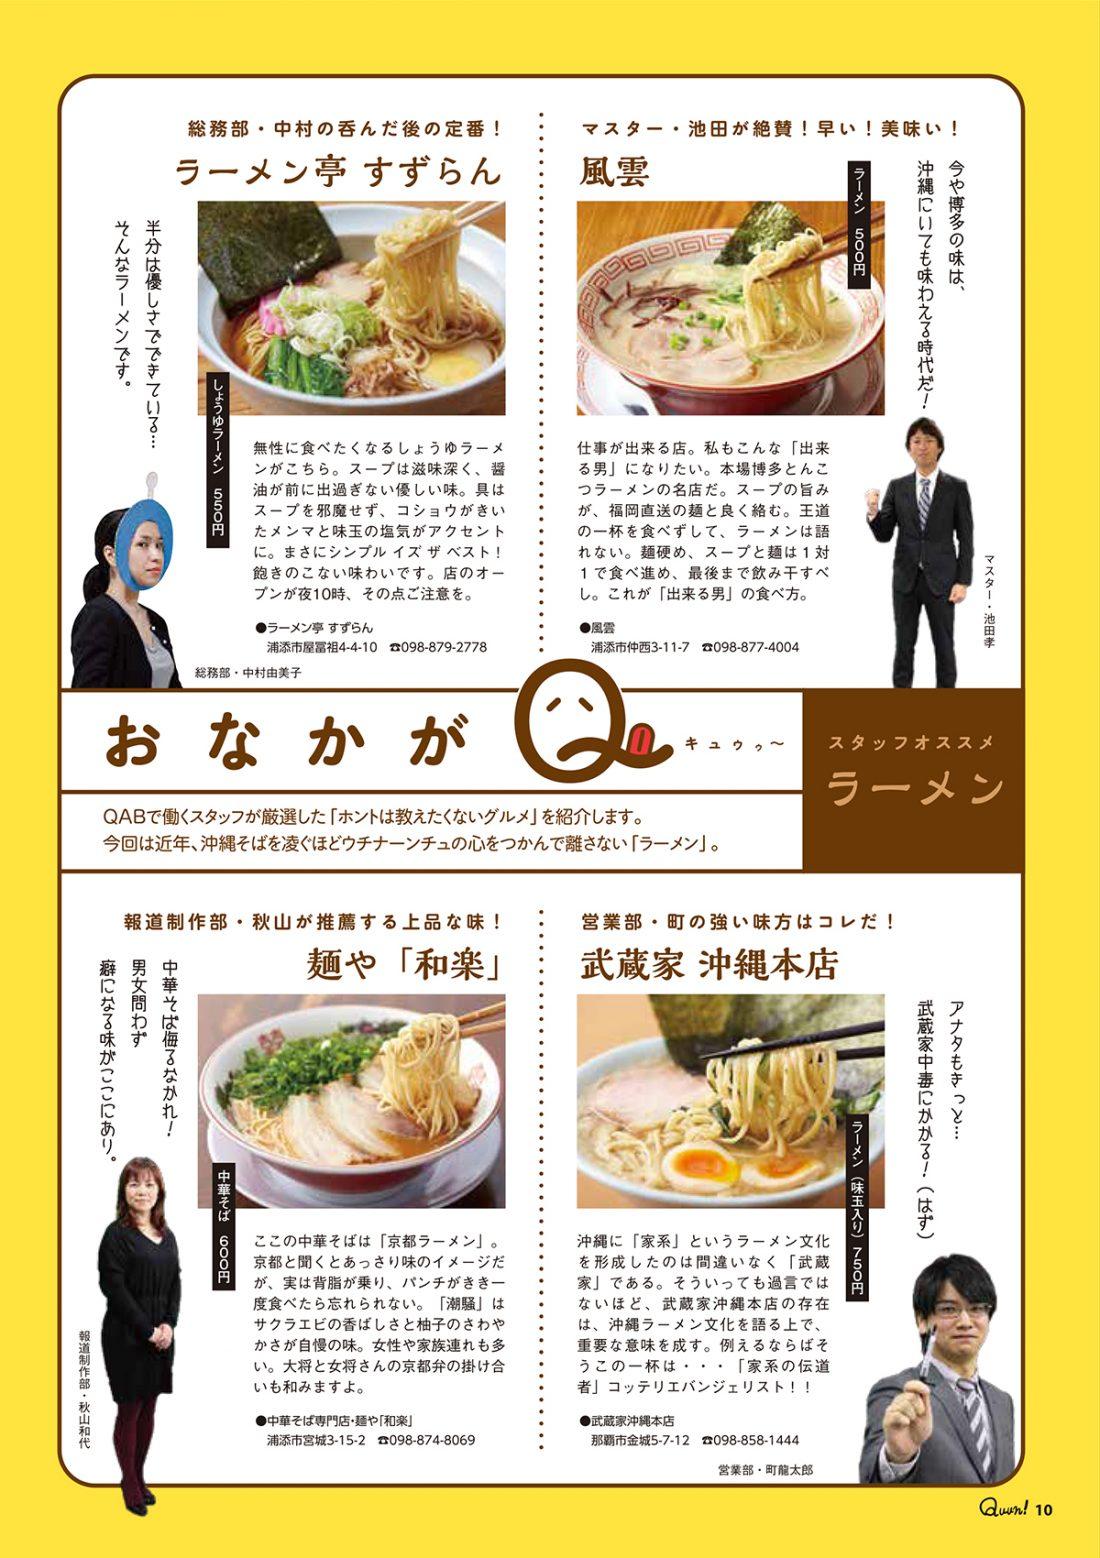 http://www.qab.co.jp/qgoro/wp-content/uploads/quun_0112-1100x1558.jpg